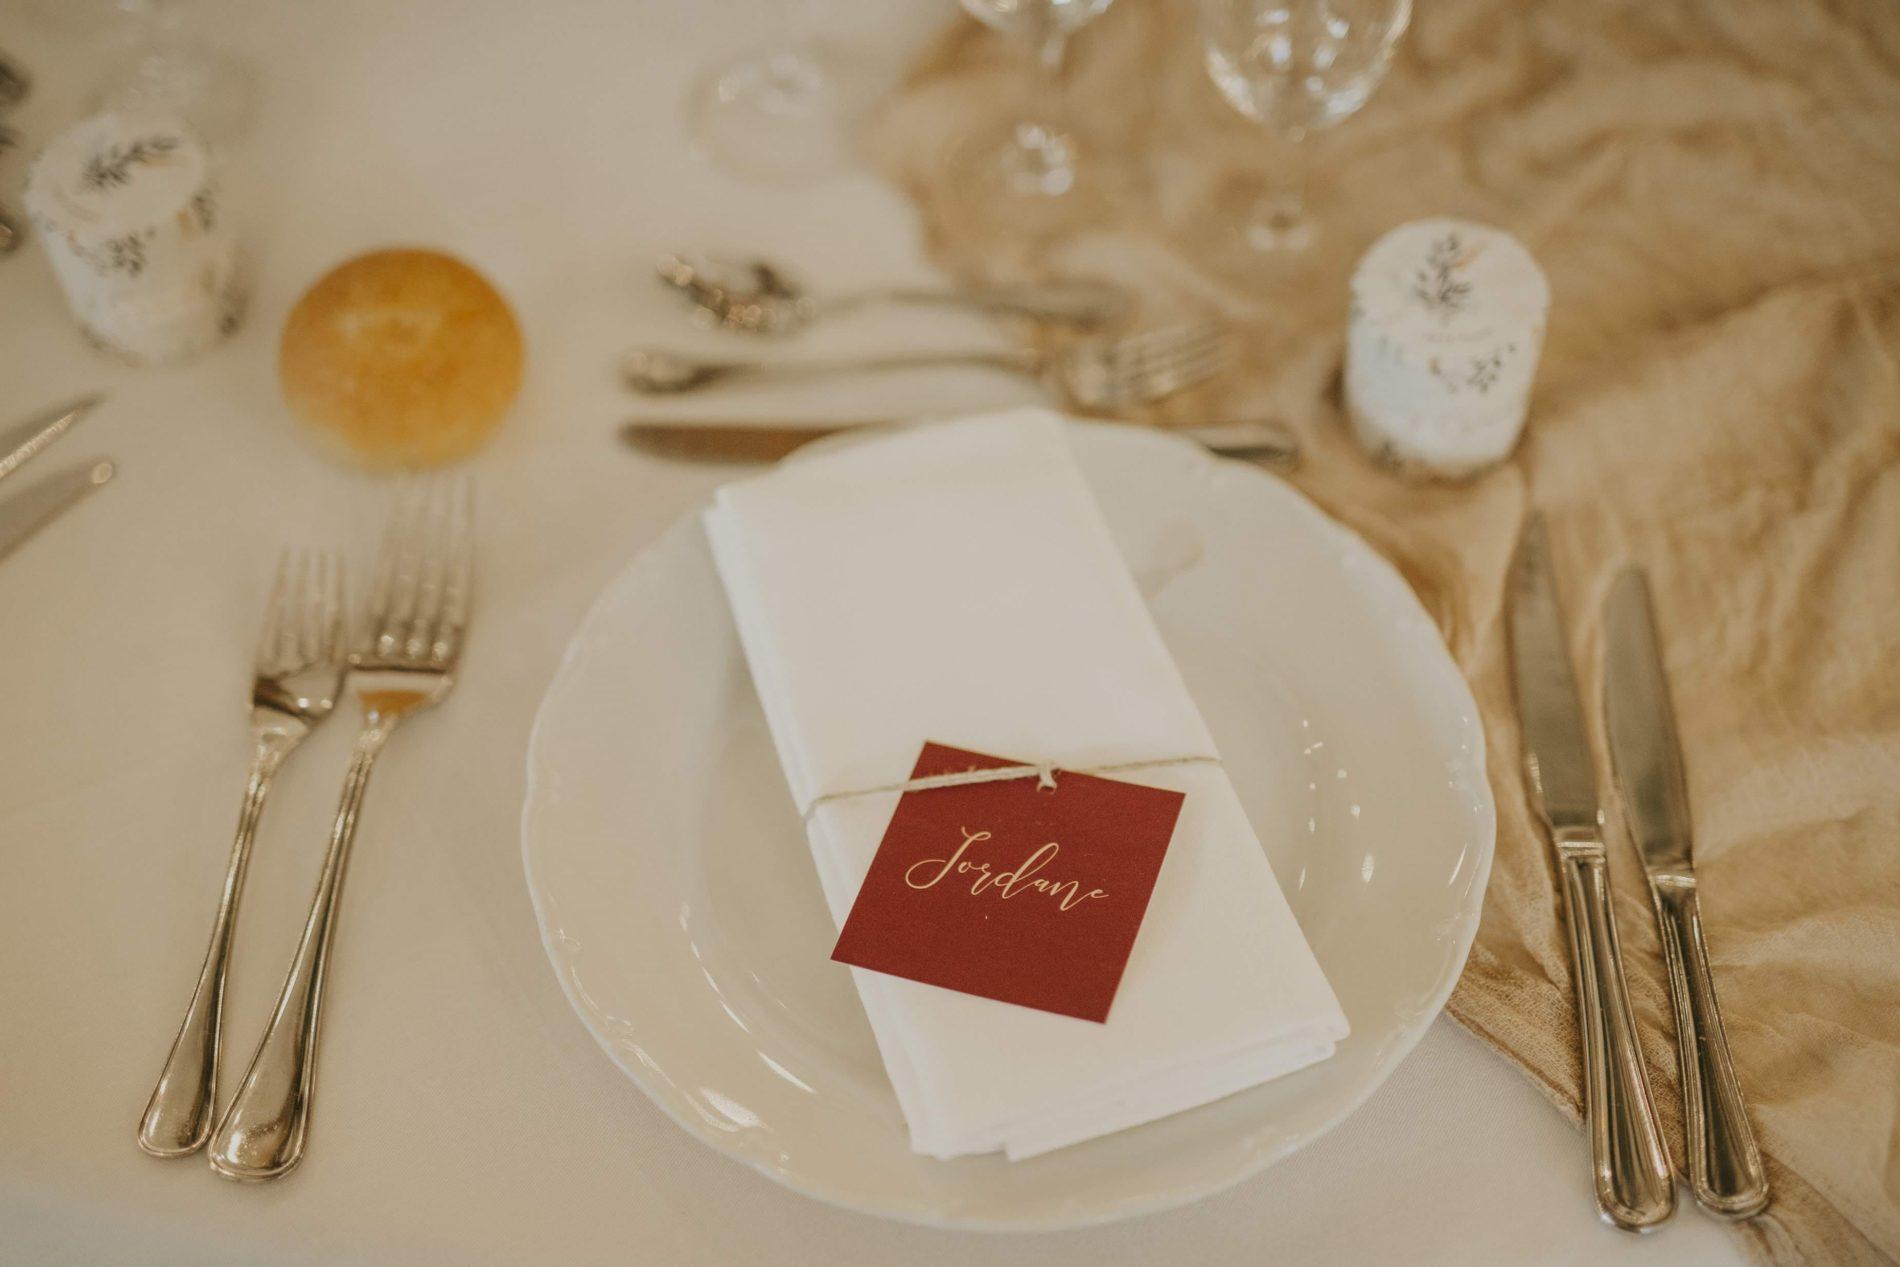 0150_04-CelineSereivuth-152-obonheurdesdames-decoration-mariage-location-Jordane-Chaillou